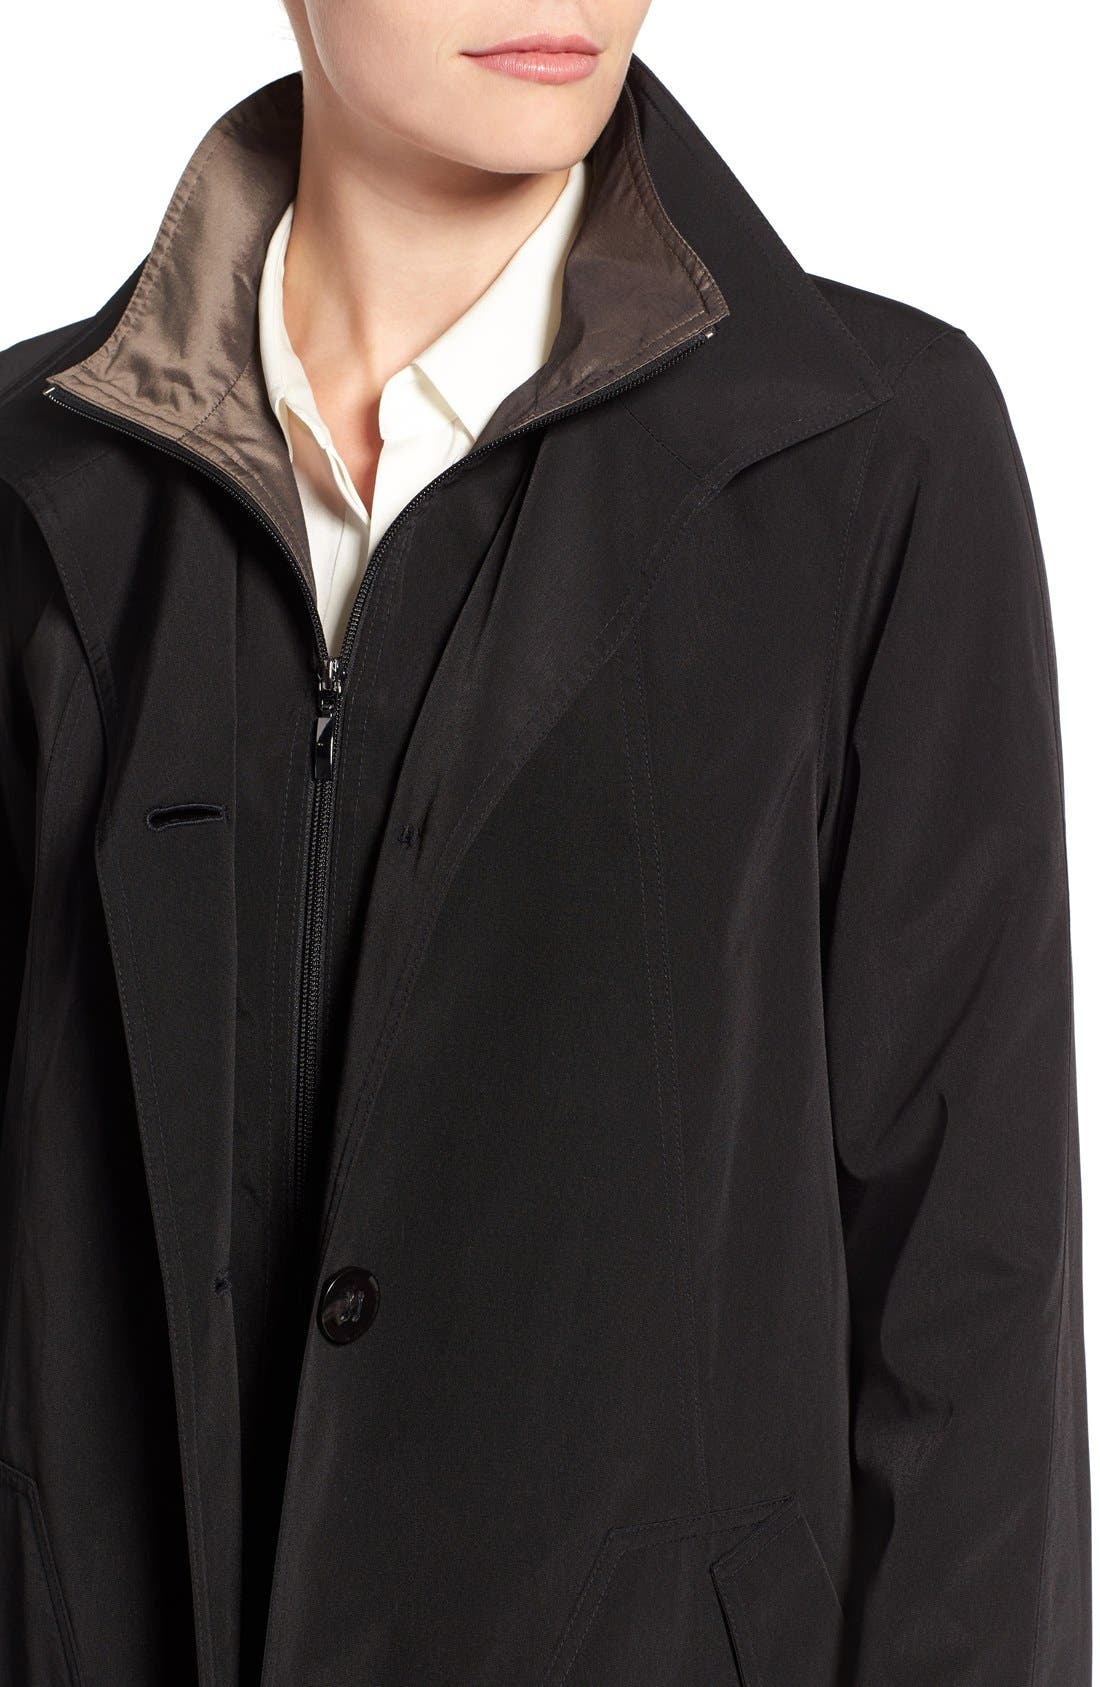 Full Length Two-Tone Silk Look Raincoat,                             Alternate thumbnail 7, color,                             BLACK